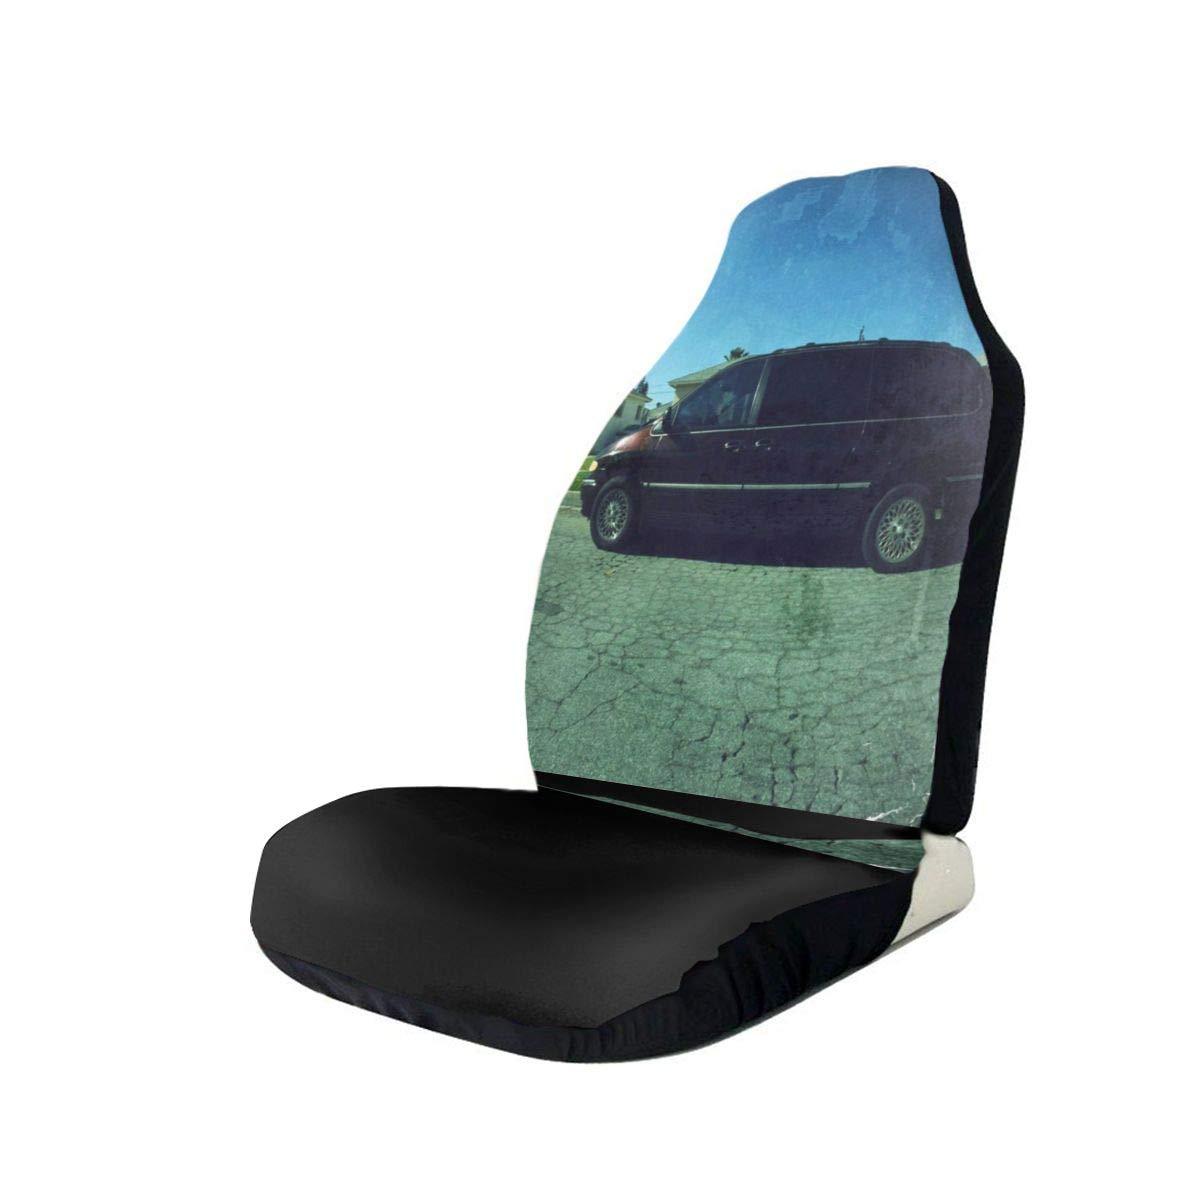 Wondrous Amazon Com Car Seat Covers Kendrick Lamar Good Kid M A A D Andrewgaddart Wooden Chair Designs For Living Room Andrewgaddartcom